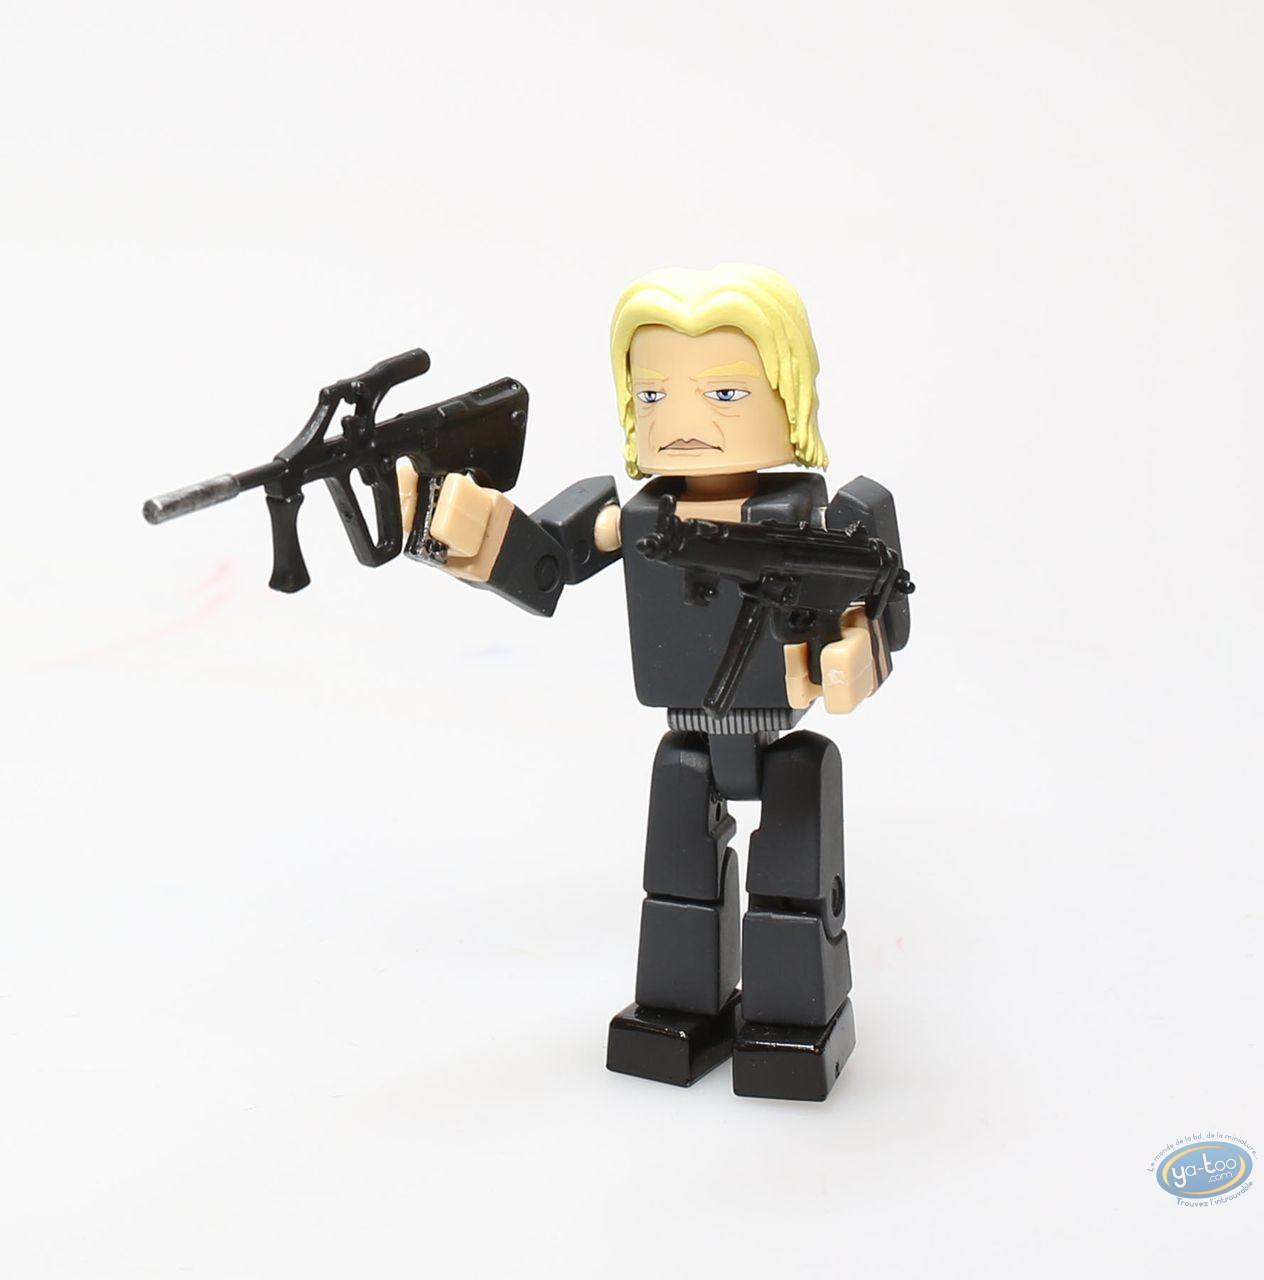 Figurine plastique, Die Hard : Al Powell